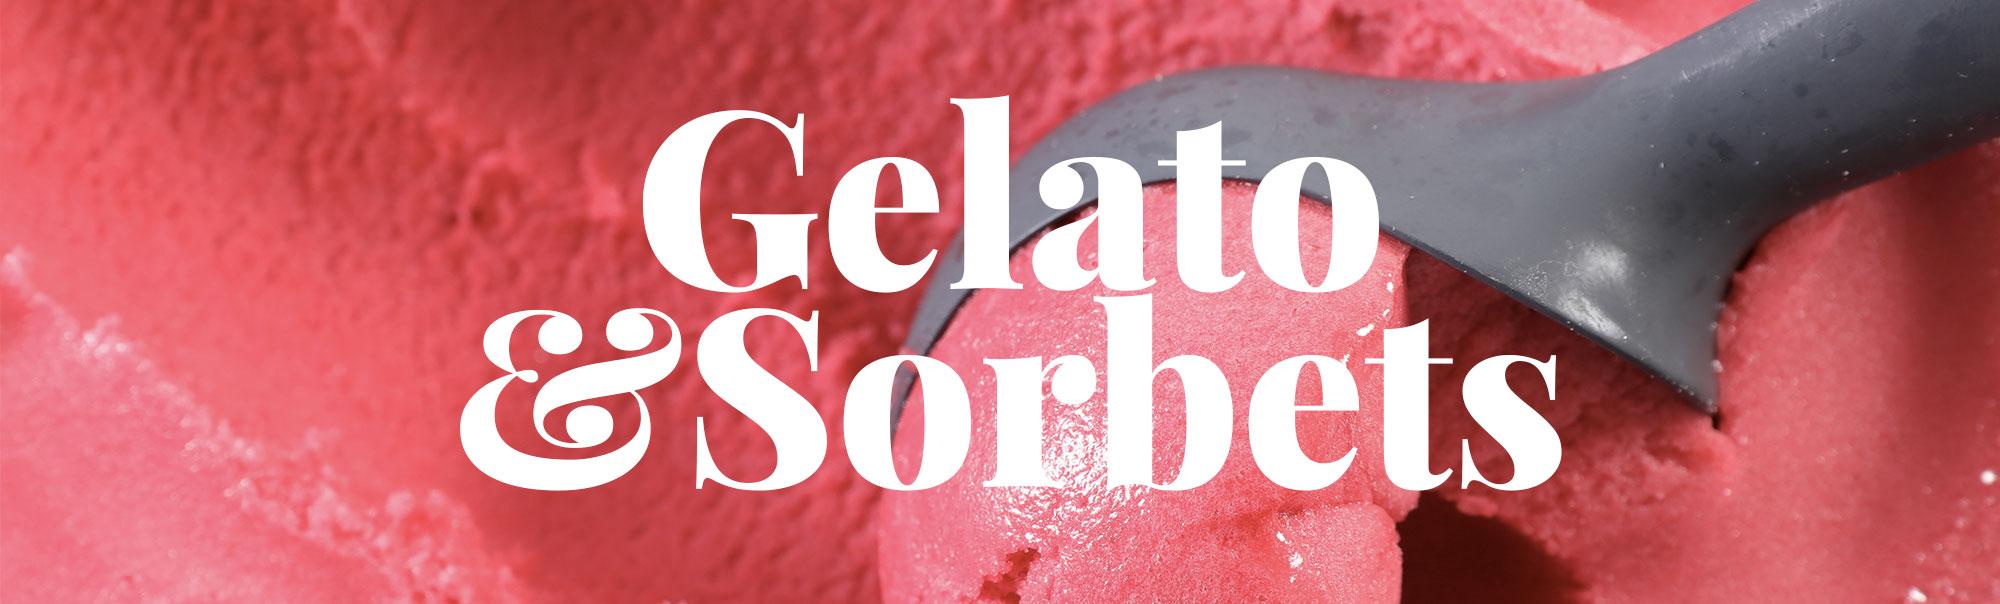 Atelier-Monnier-Menu-gelato-Sorbets-Banner